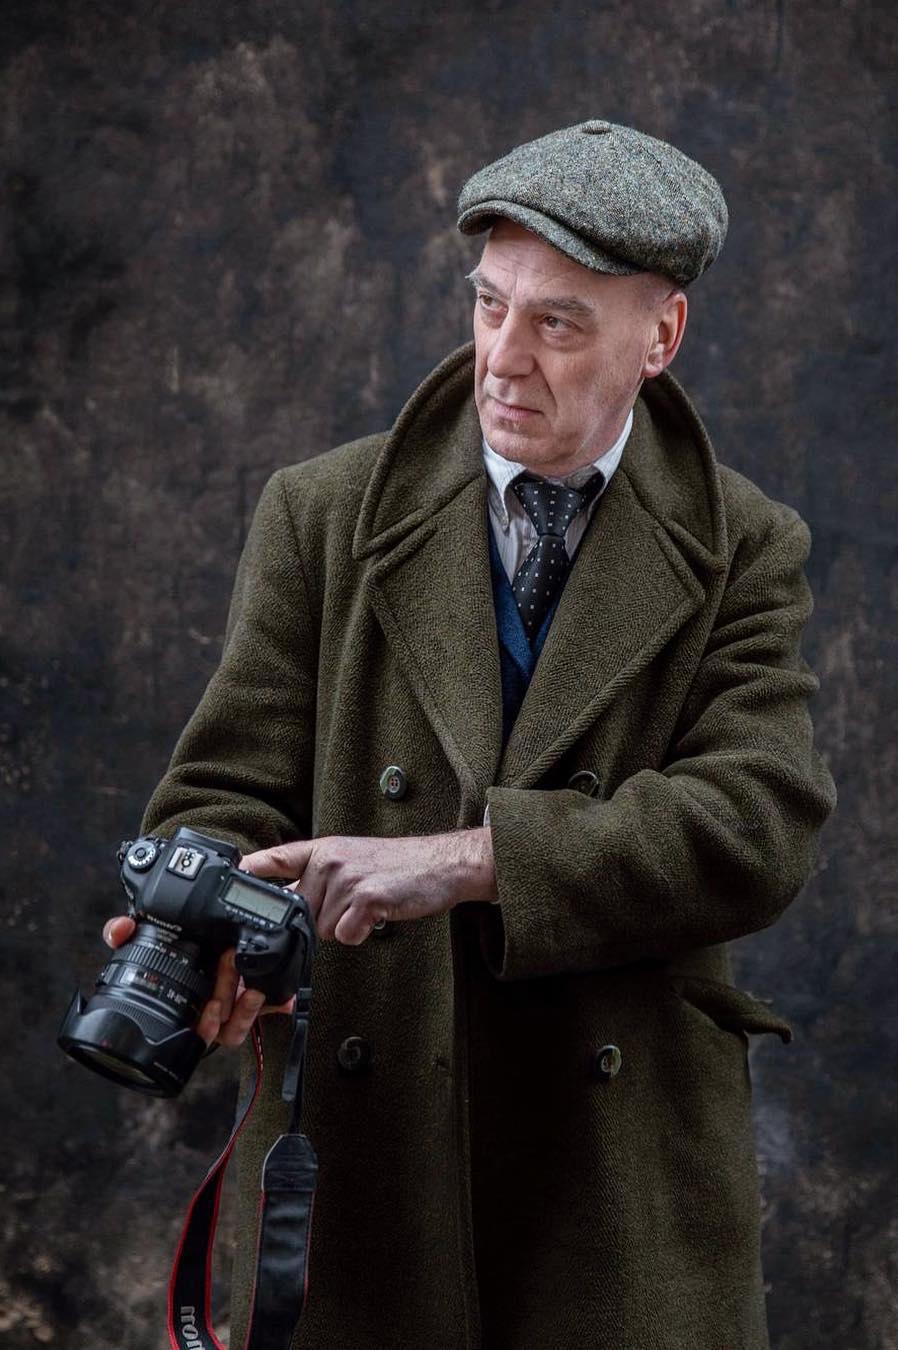 Graham Currey